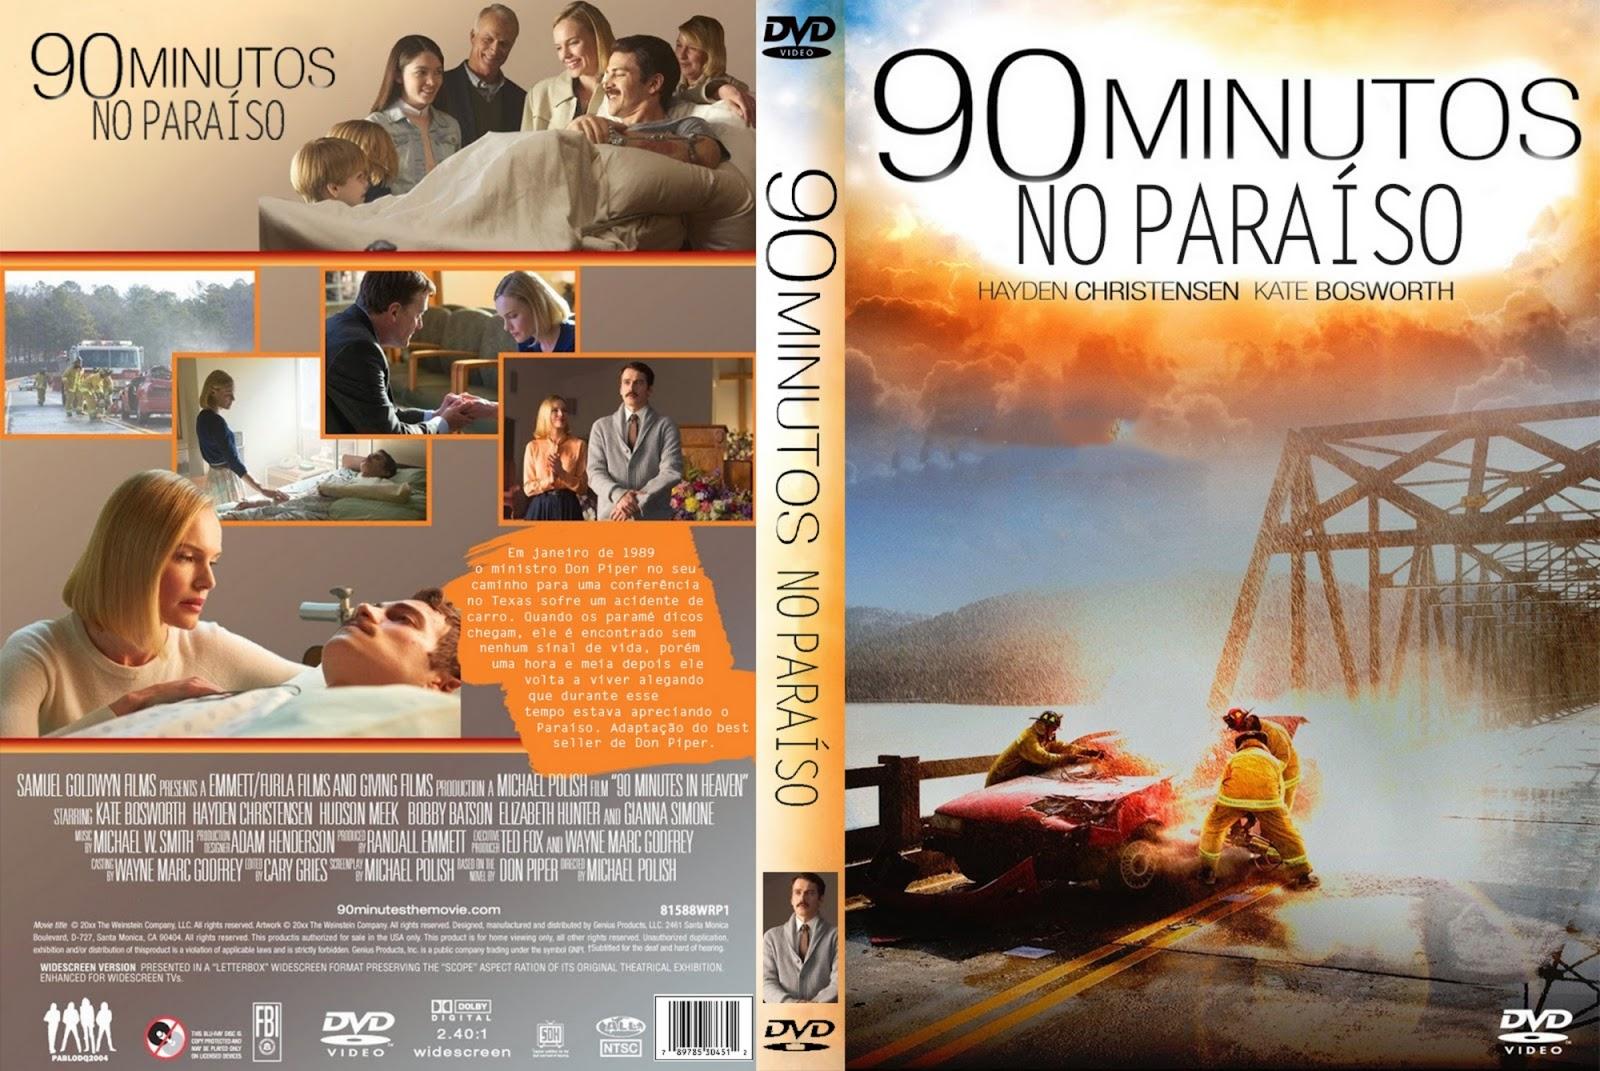 90 Minutos no Paraíso BDRip XviD Dual Áudio 90 2BMinutos 2Bno 2BPara 25C3 25ADso 2BXANDAODOWNLOAD